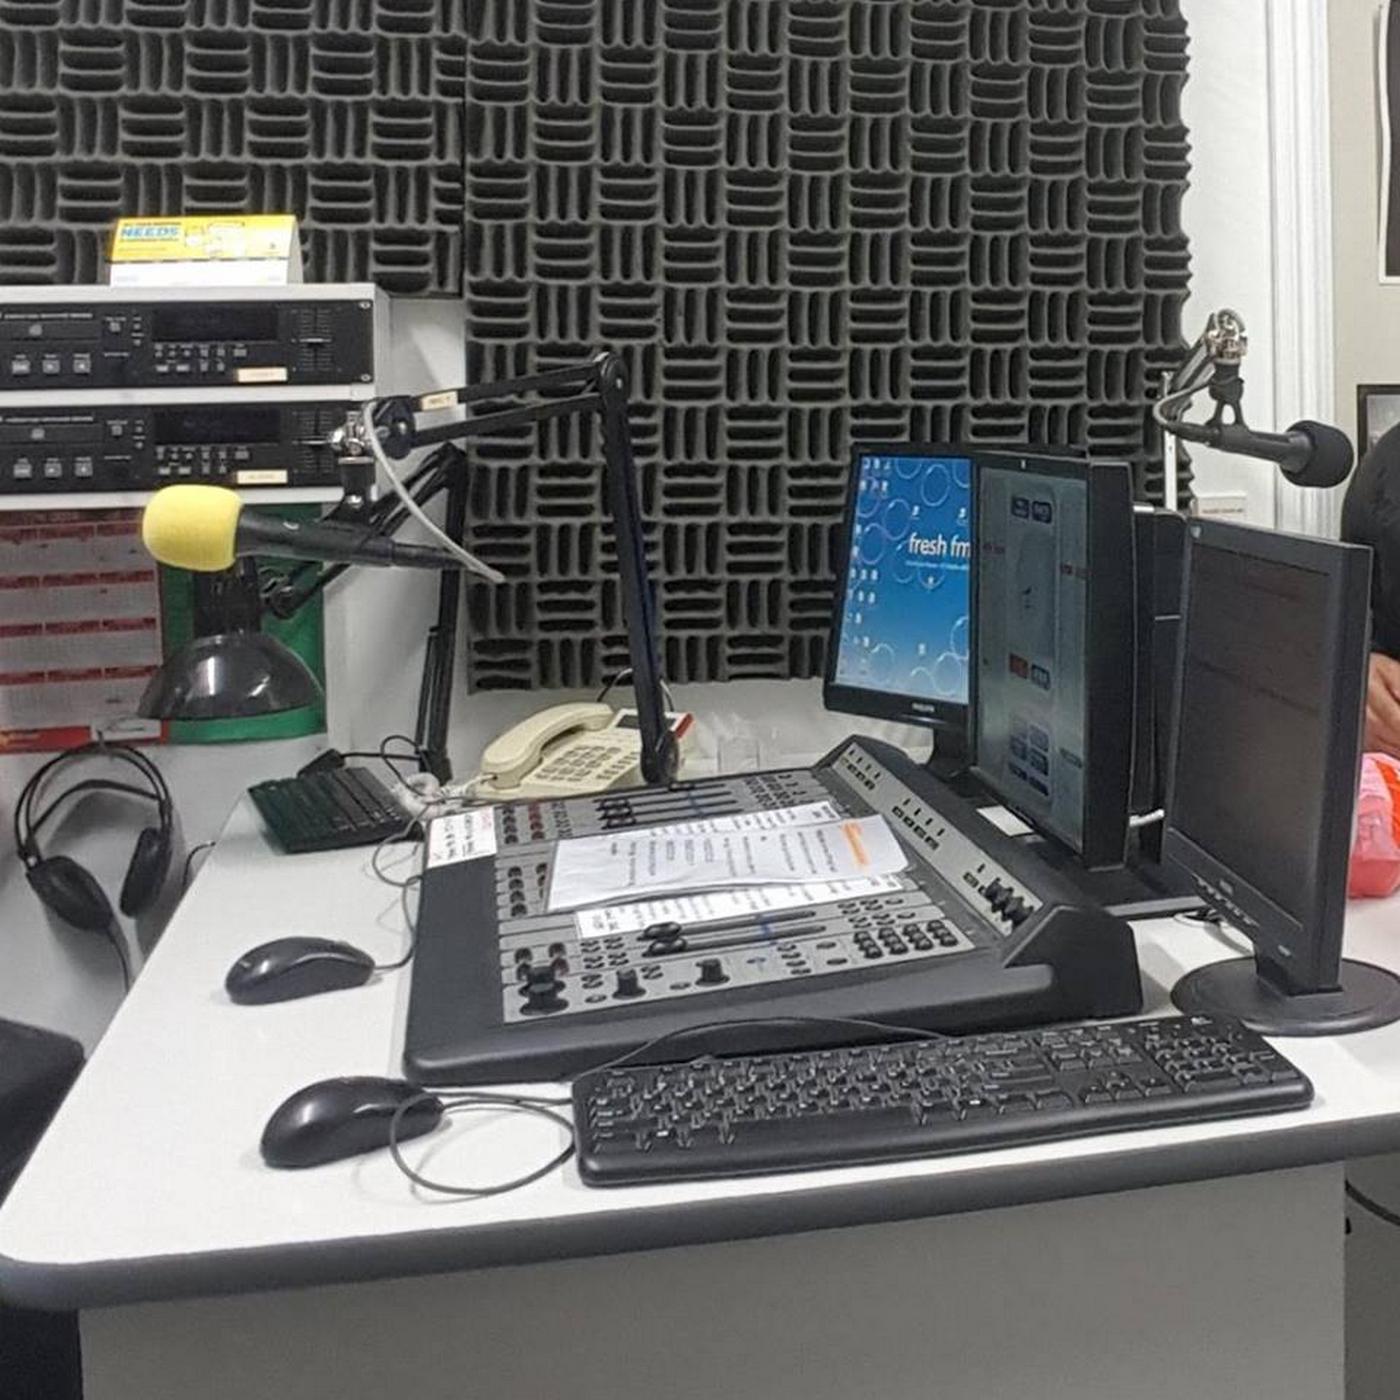 https://cdn.accessradio.org/StationFolder/freshfm/Images/Fetu-O-Samoa.png